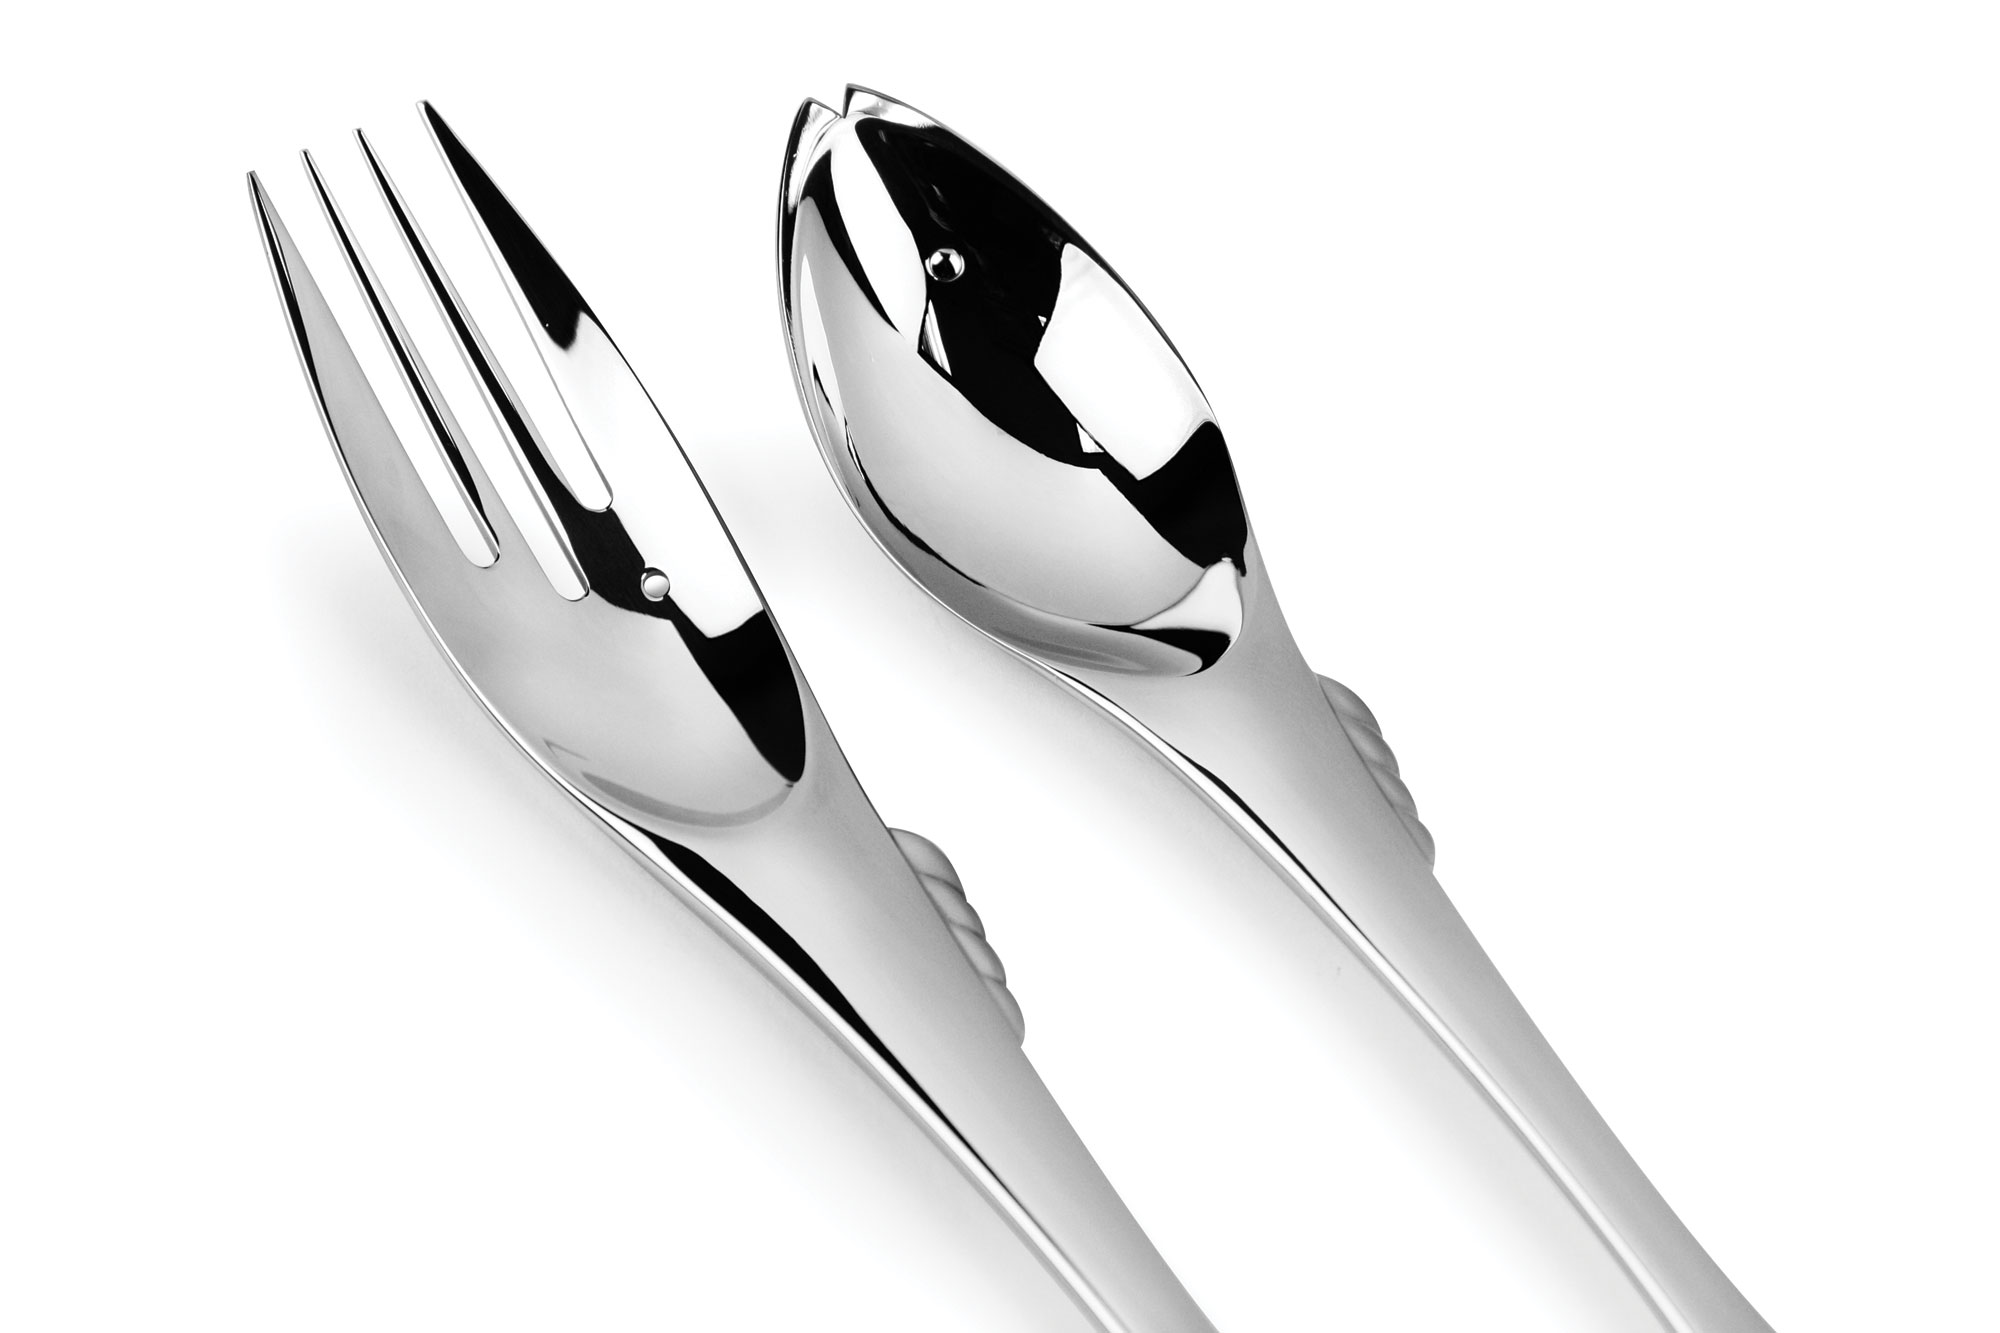 Yamazaki gone fishin 39 stainless steel flatware set 40 piece cutlery and more - Gone fishin flatware ...